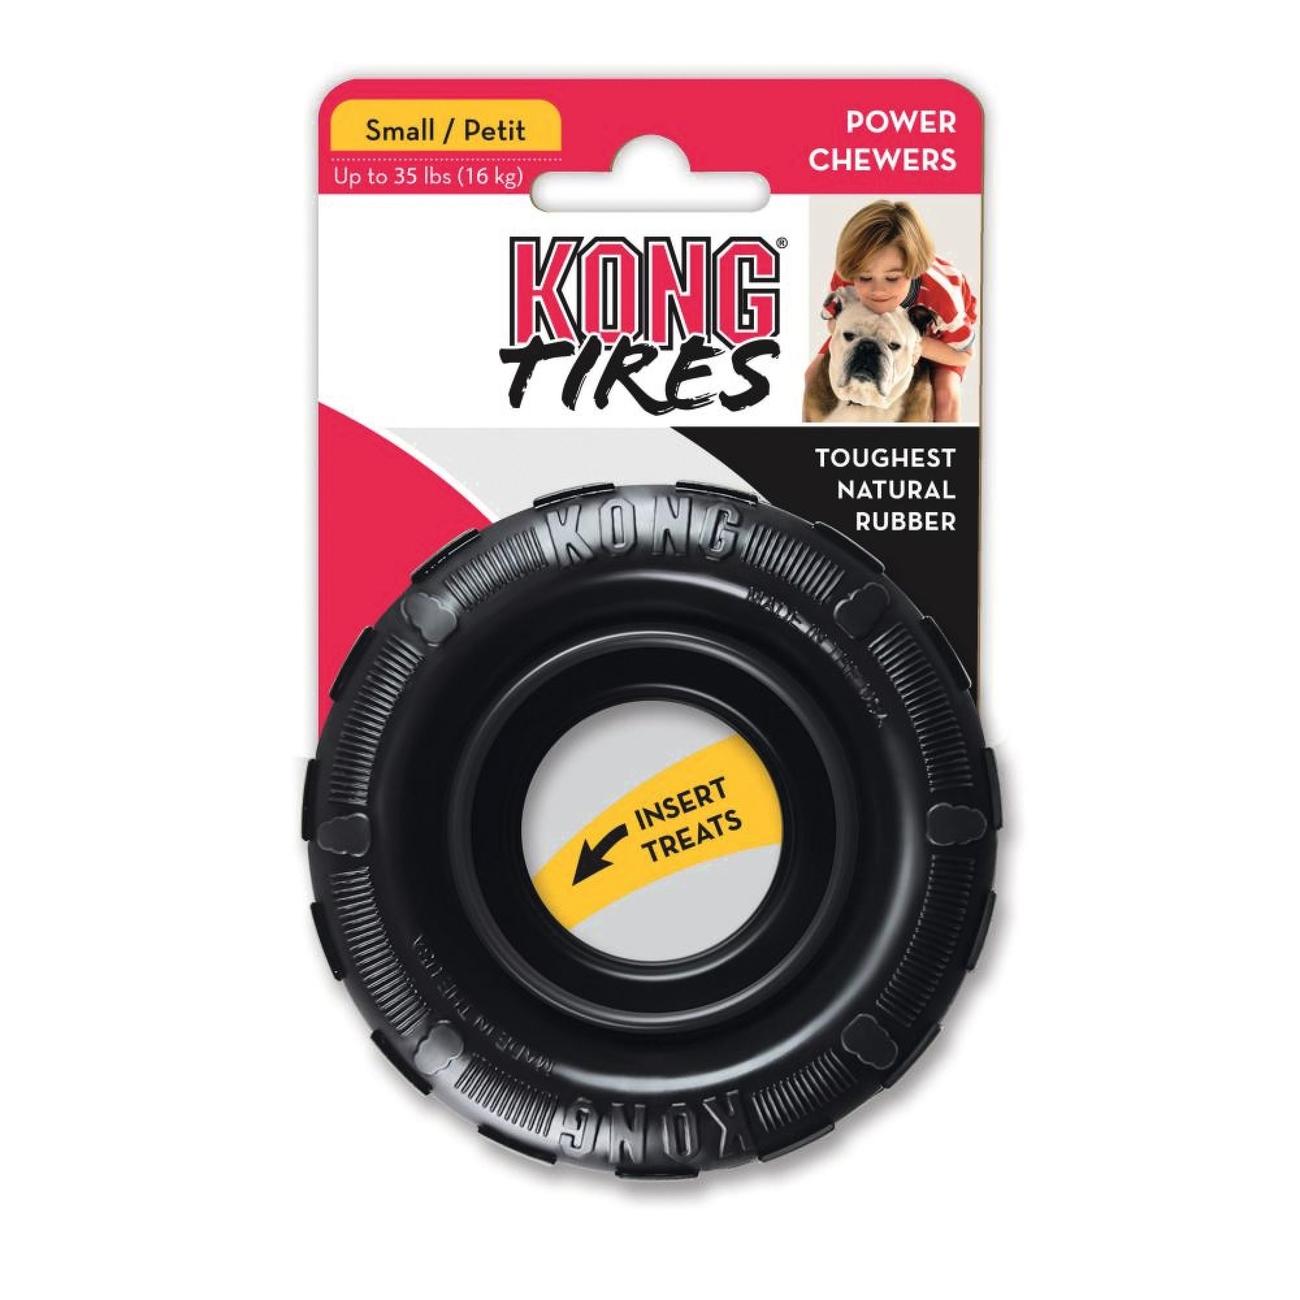 Hundespielzeug KONG Tires Kaureifen, small, Ø 9 cm